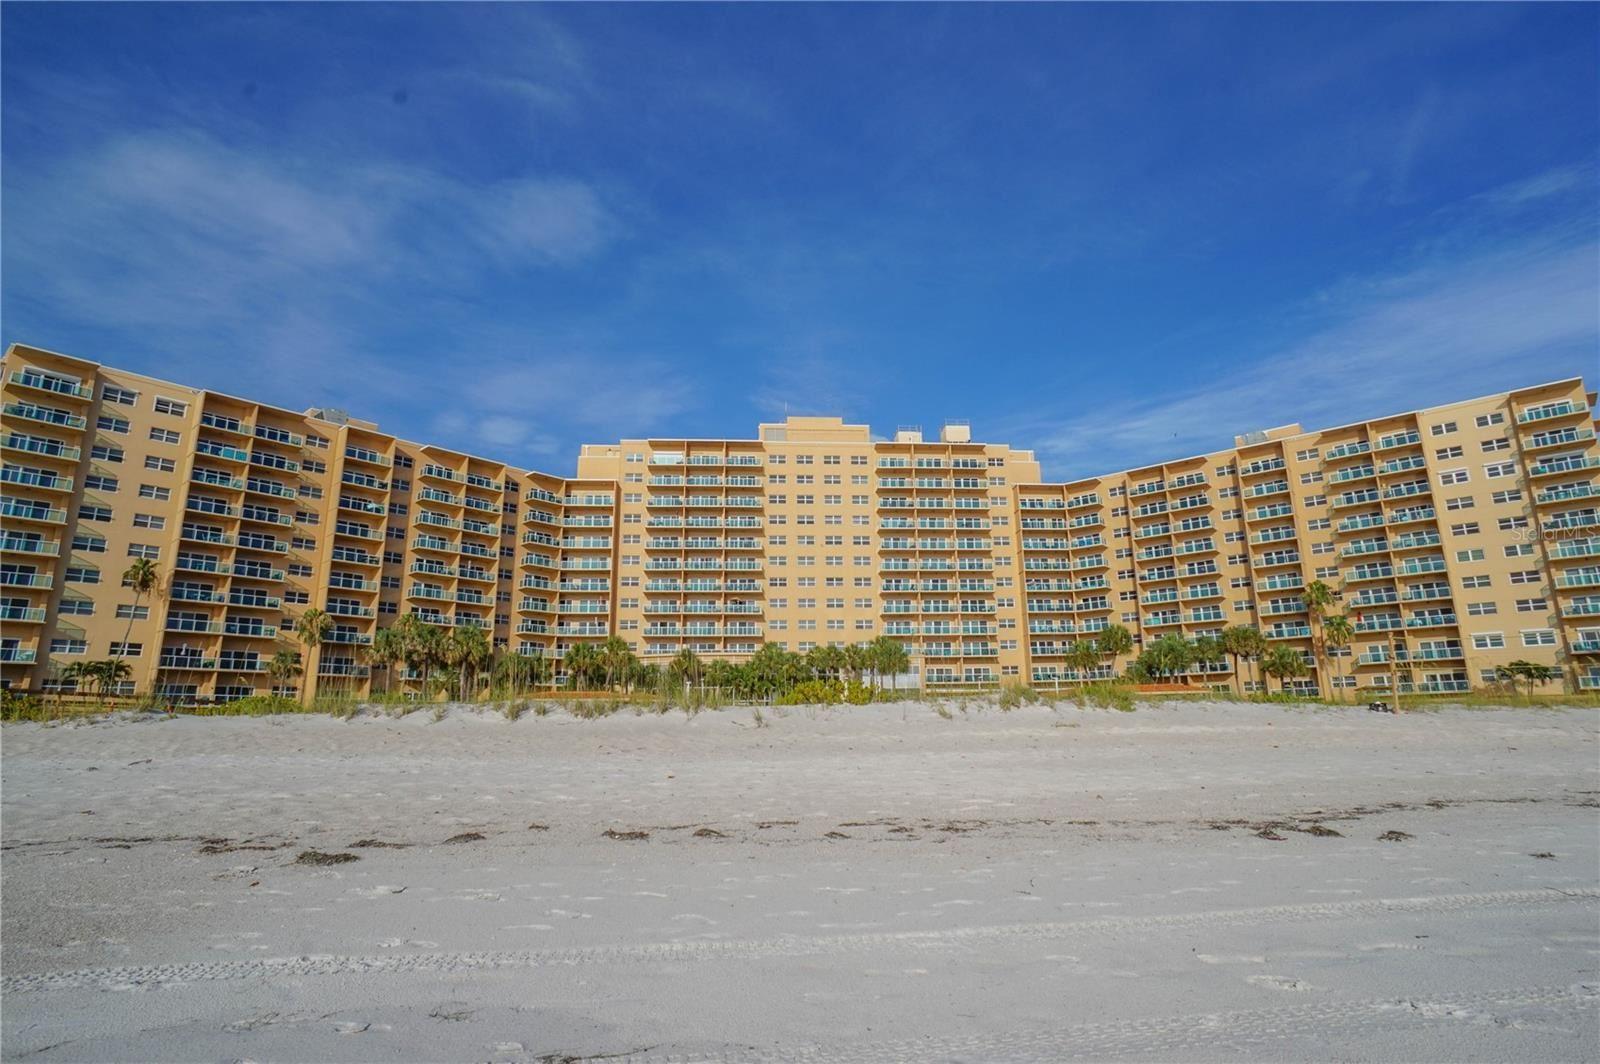 880 MANDALAY AVE #N210, Clearwater, FL 33767 - MLS#: U8128109